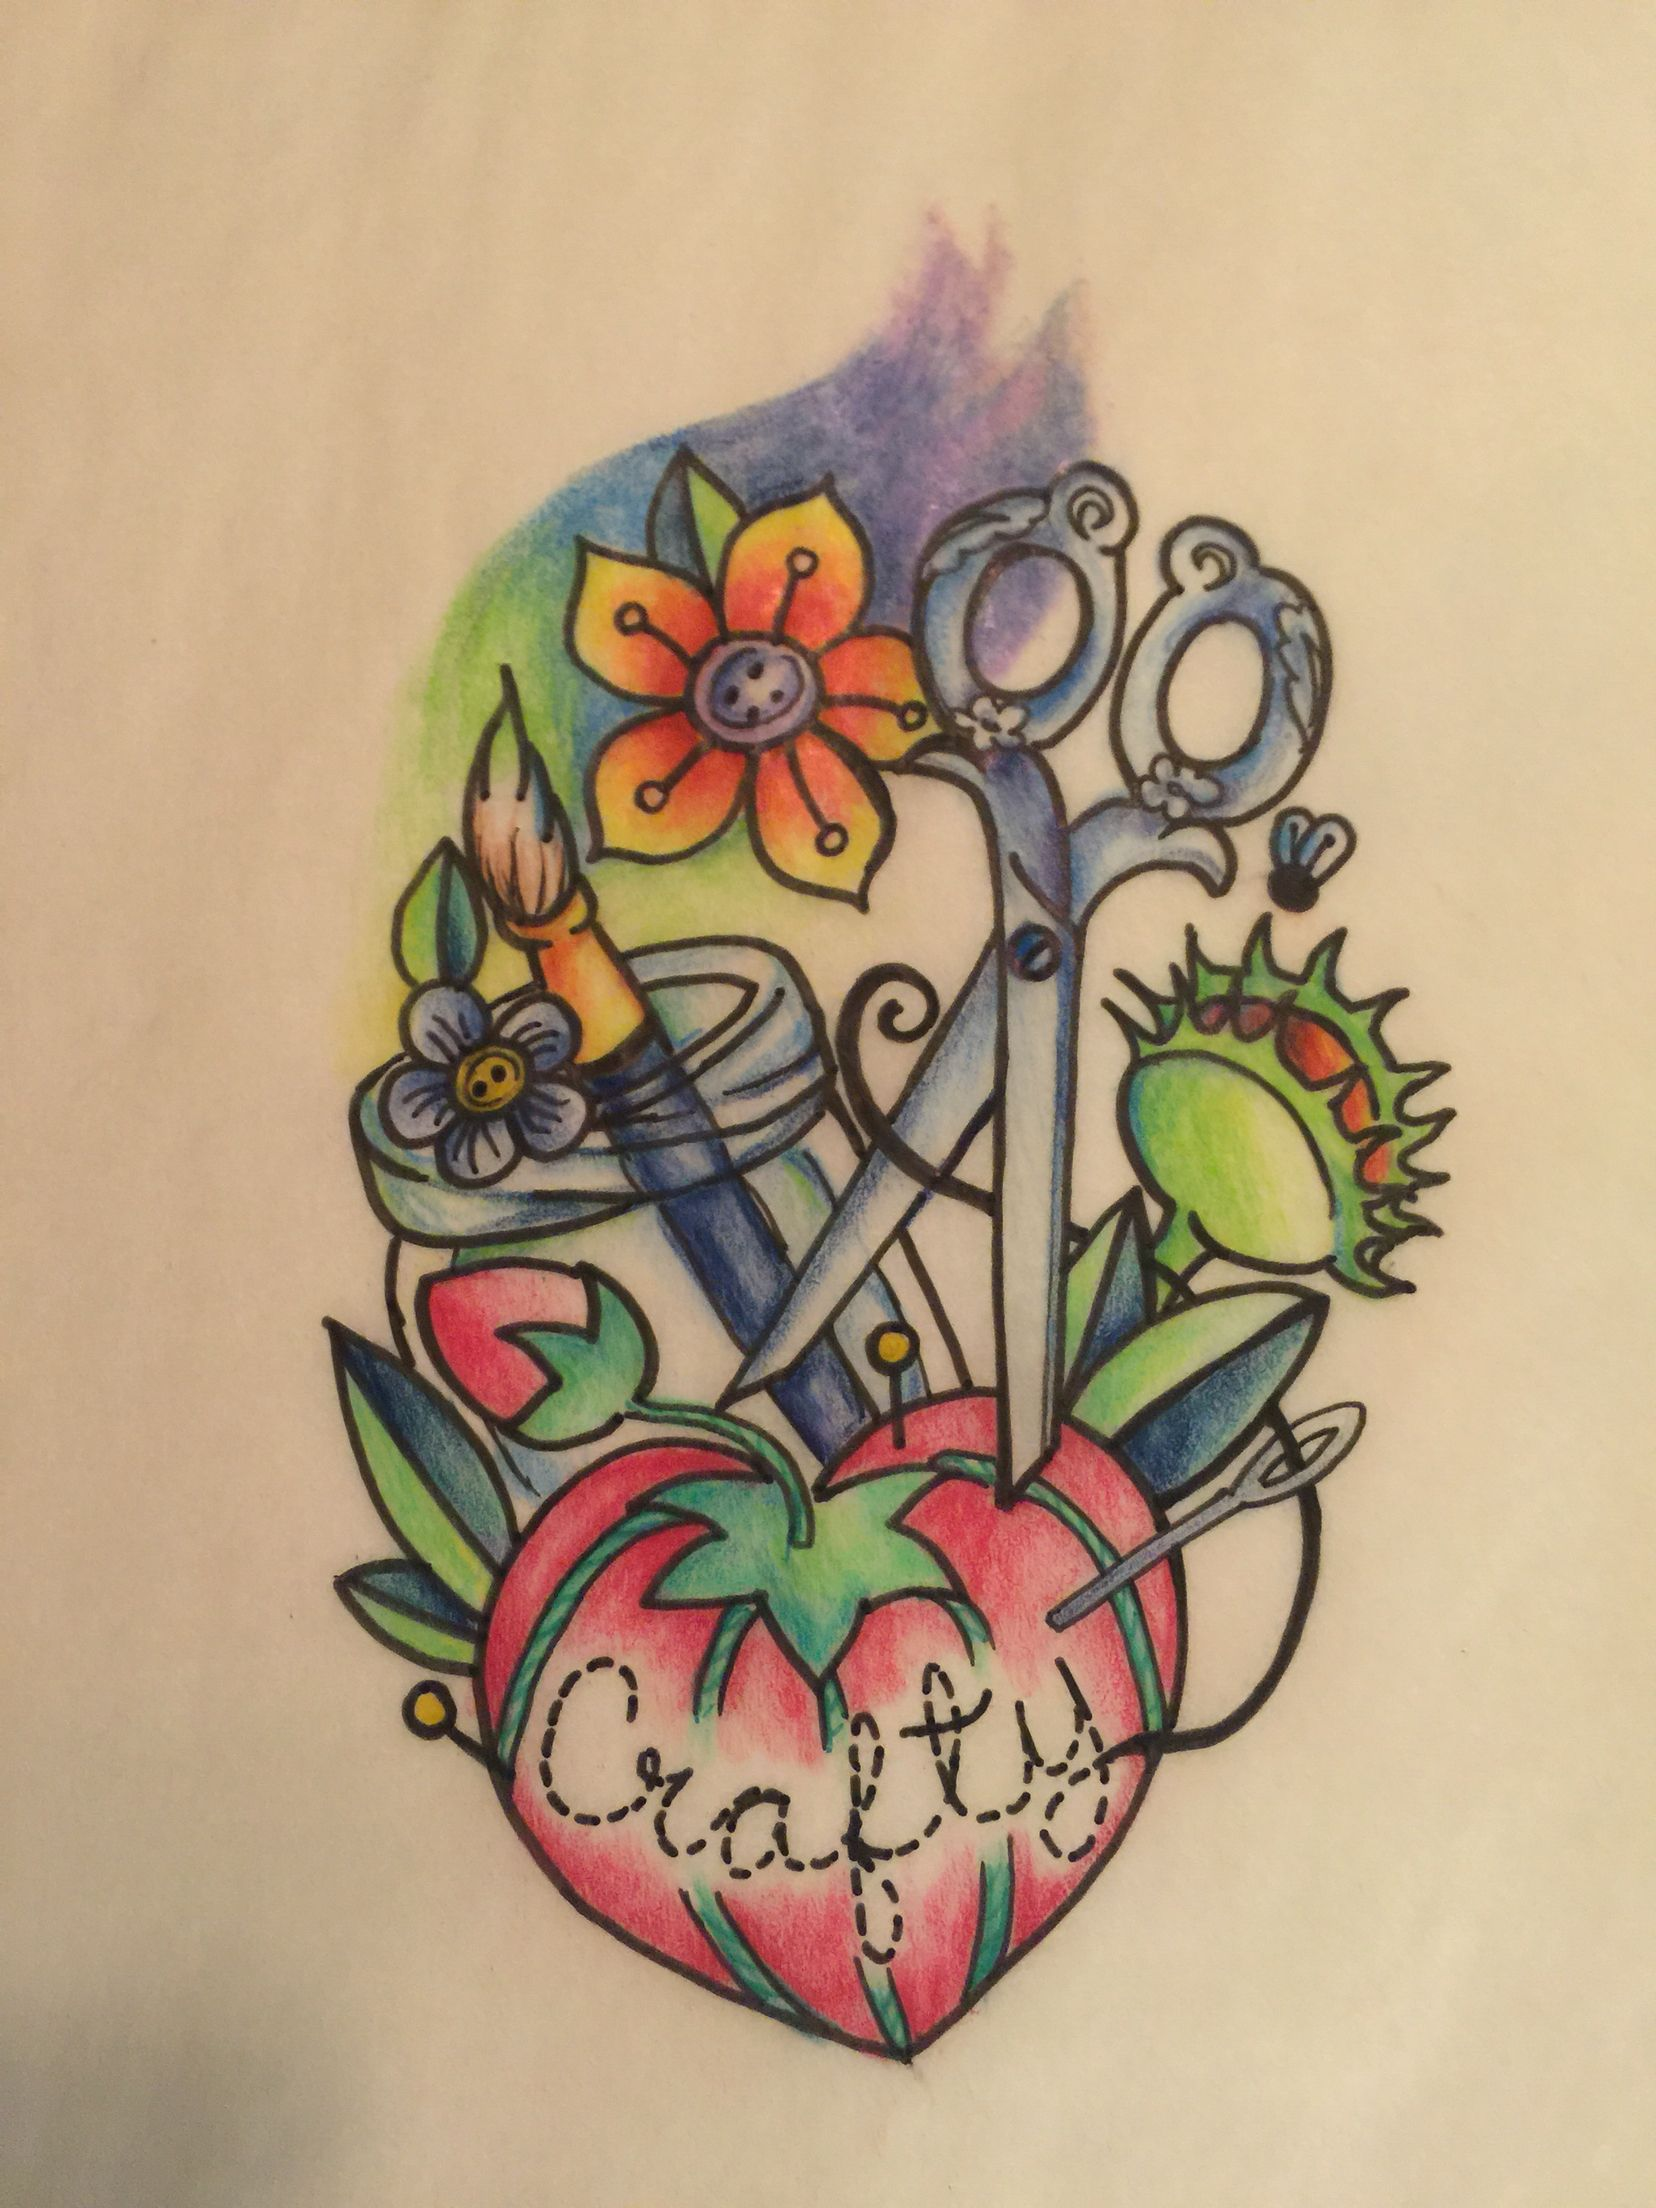 Crafty tattoo design pin cushion scissors flowers